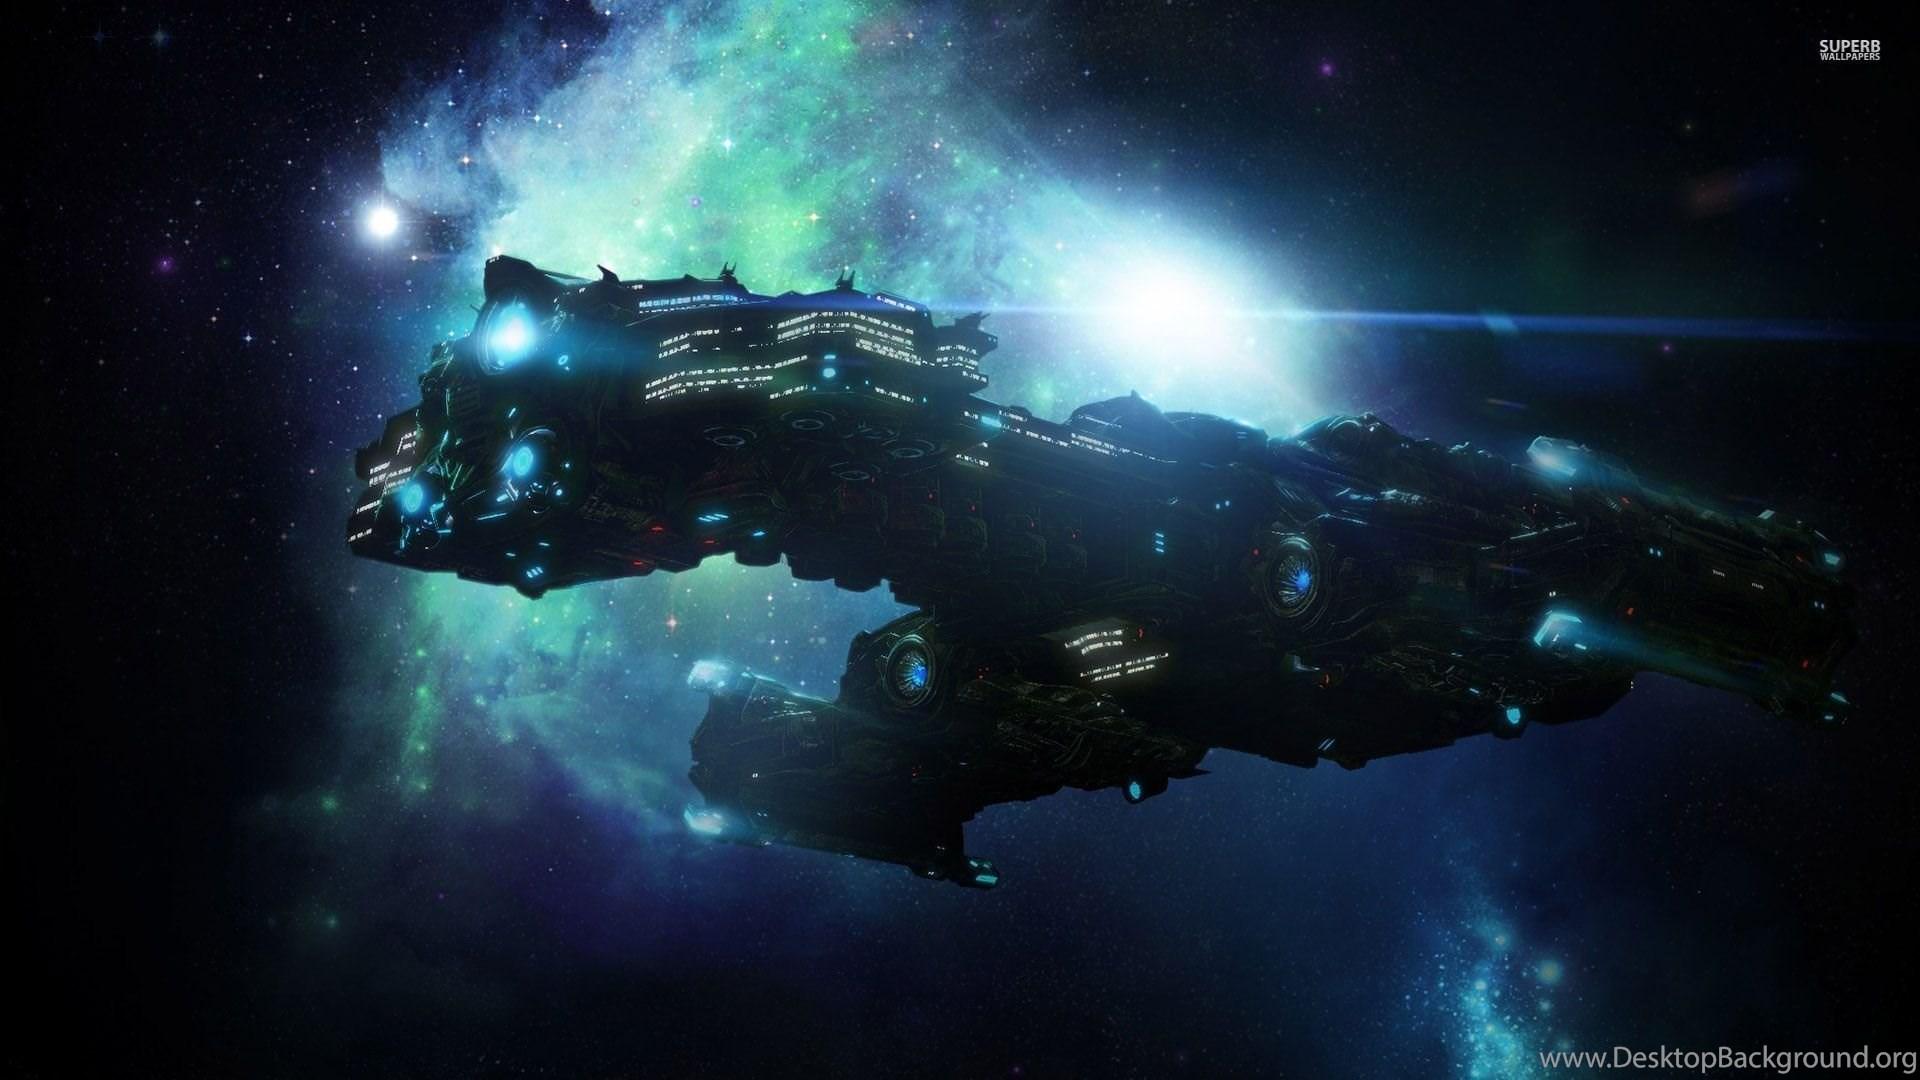 Starcraft Ii Legacy Of The Void Wallpapers Game Wallpapers Desktop